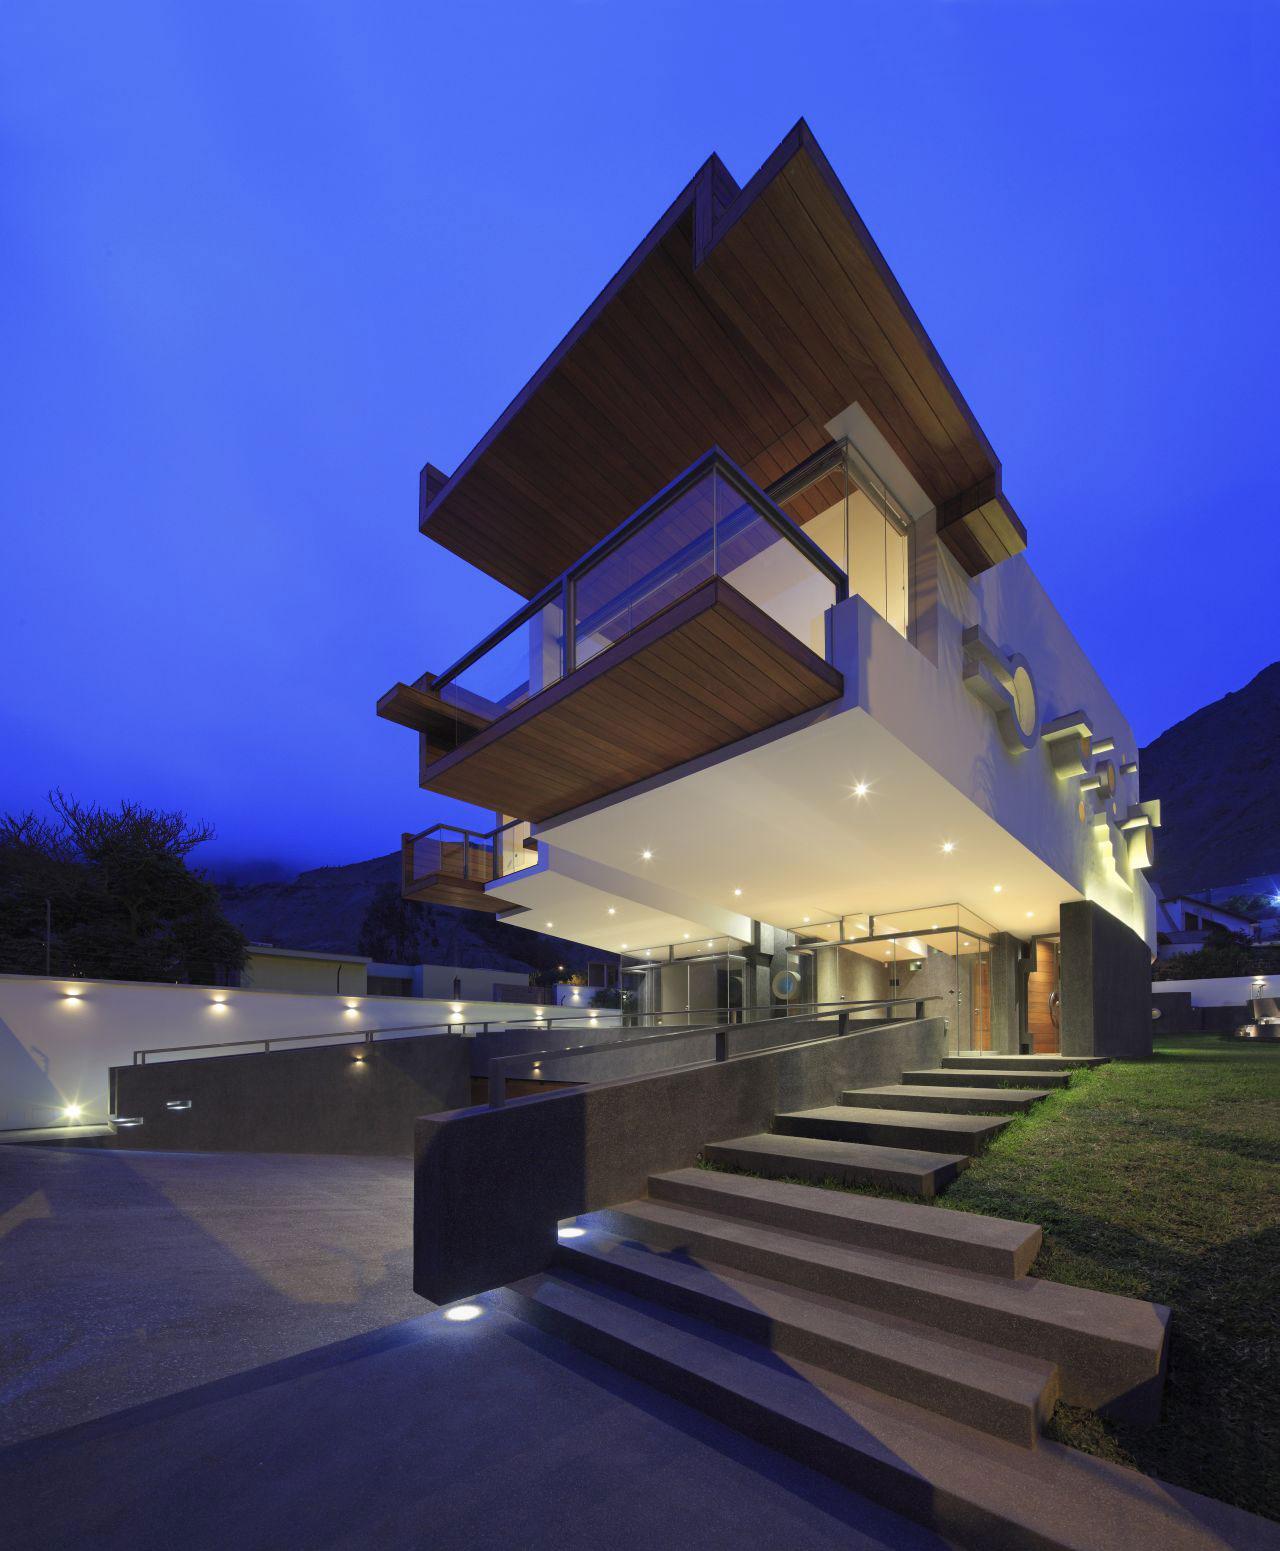 Garden, Evening, Lighting, Home in La Planicie, Lima